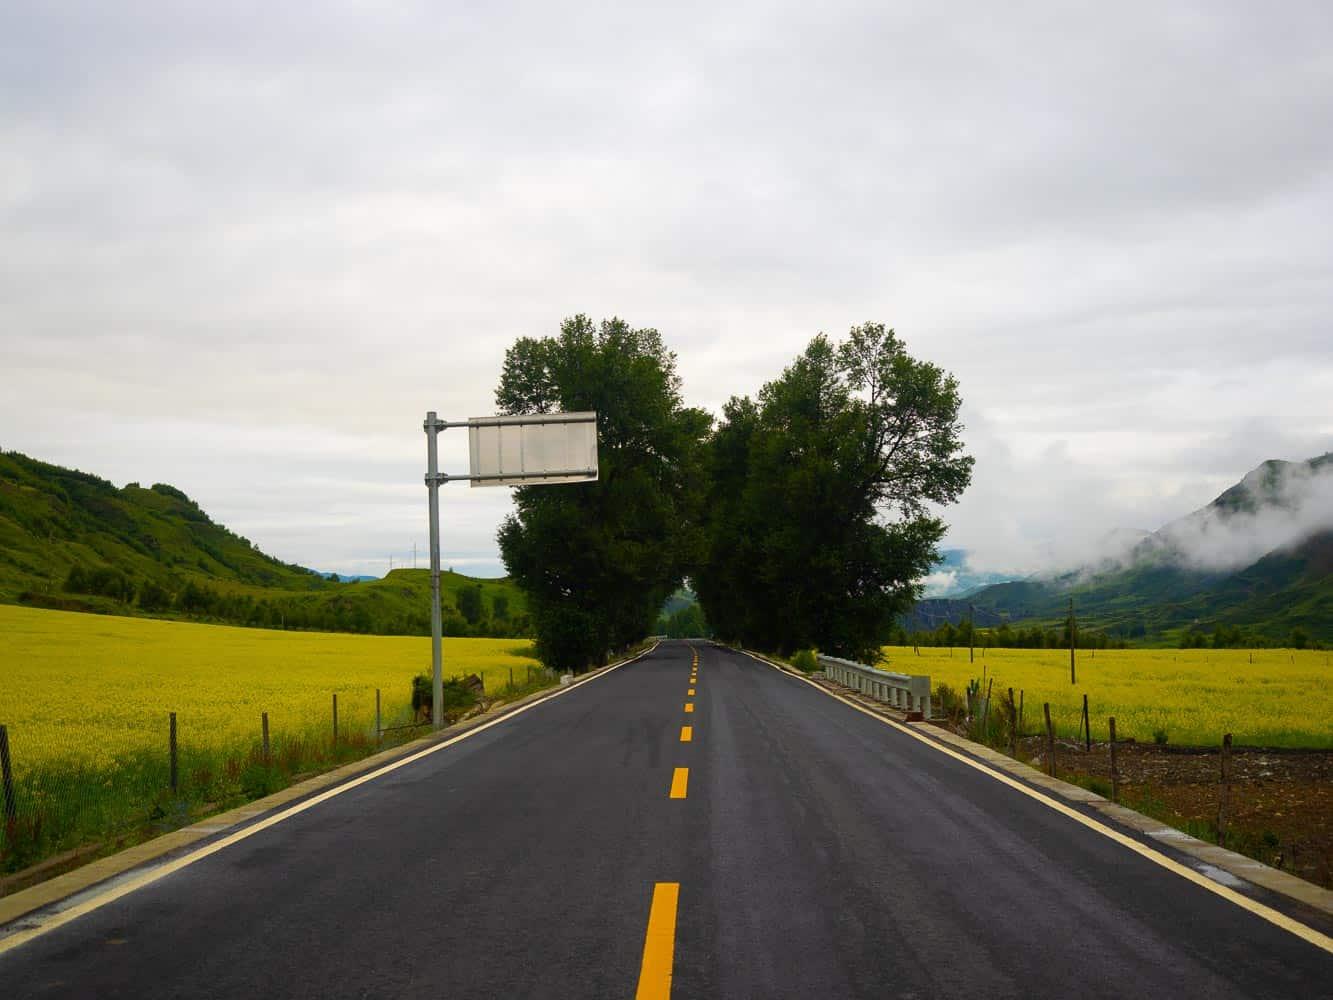 sichuan road trip china